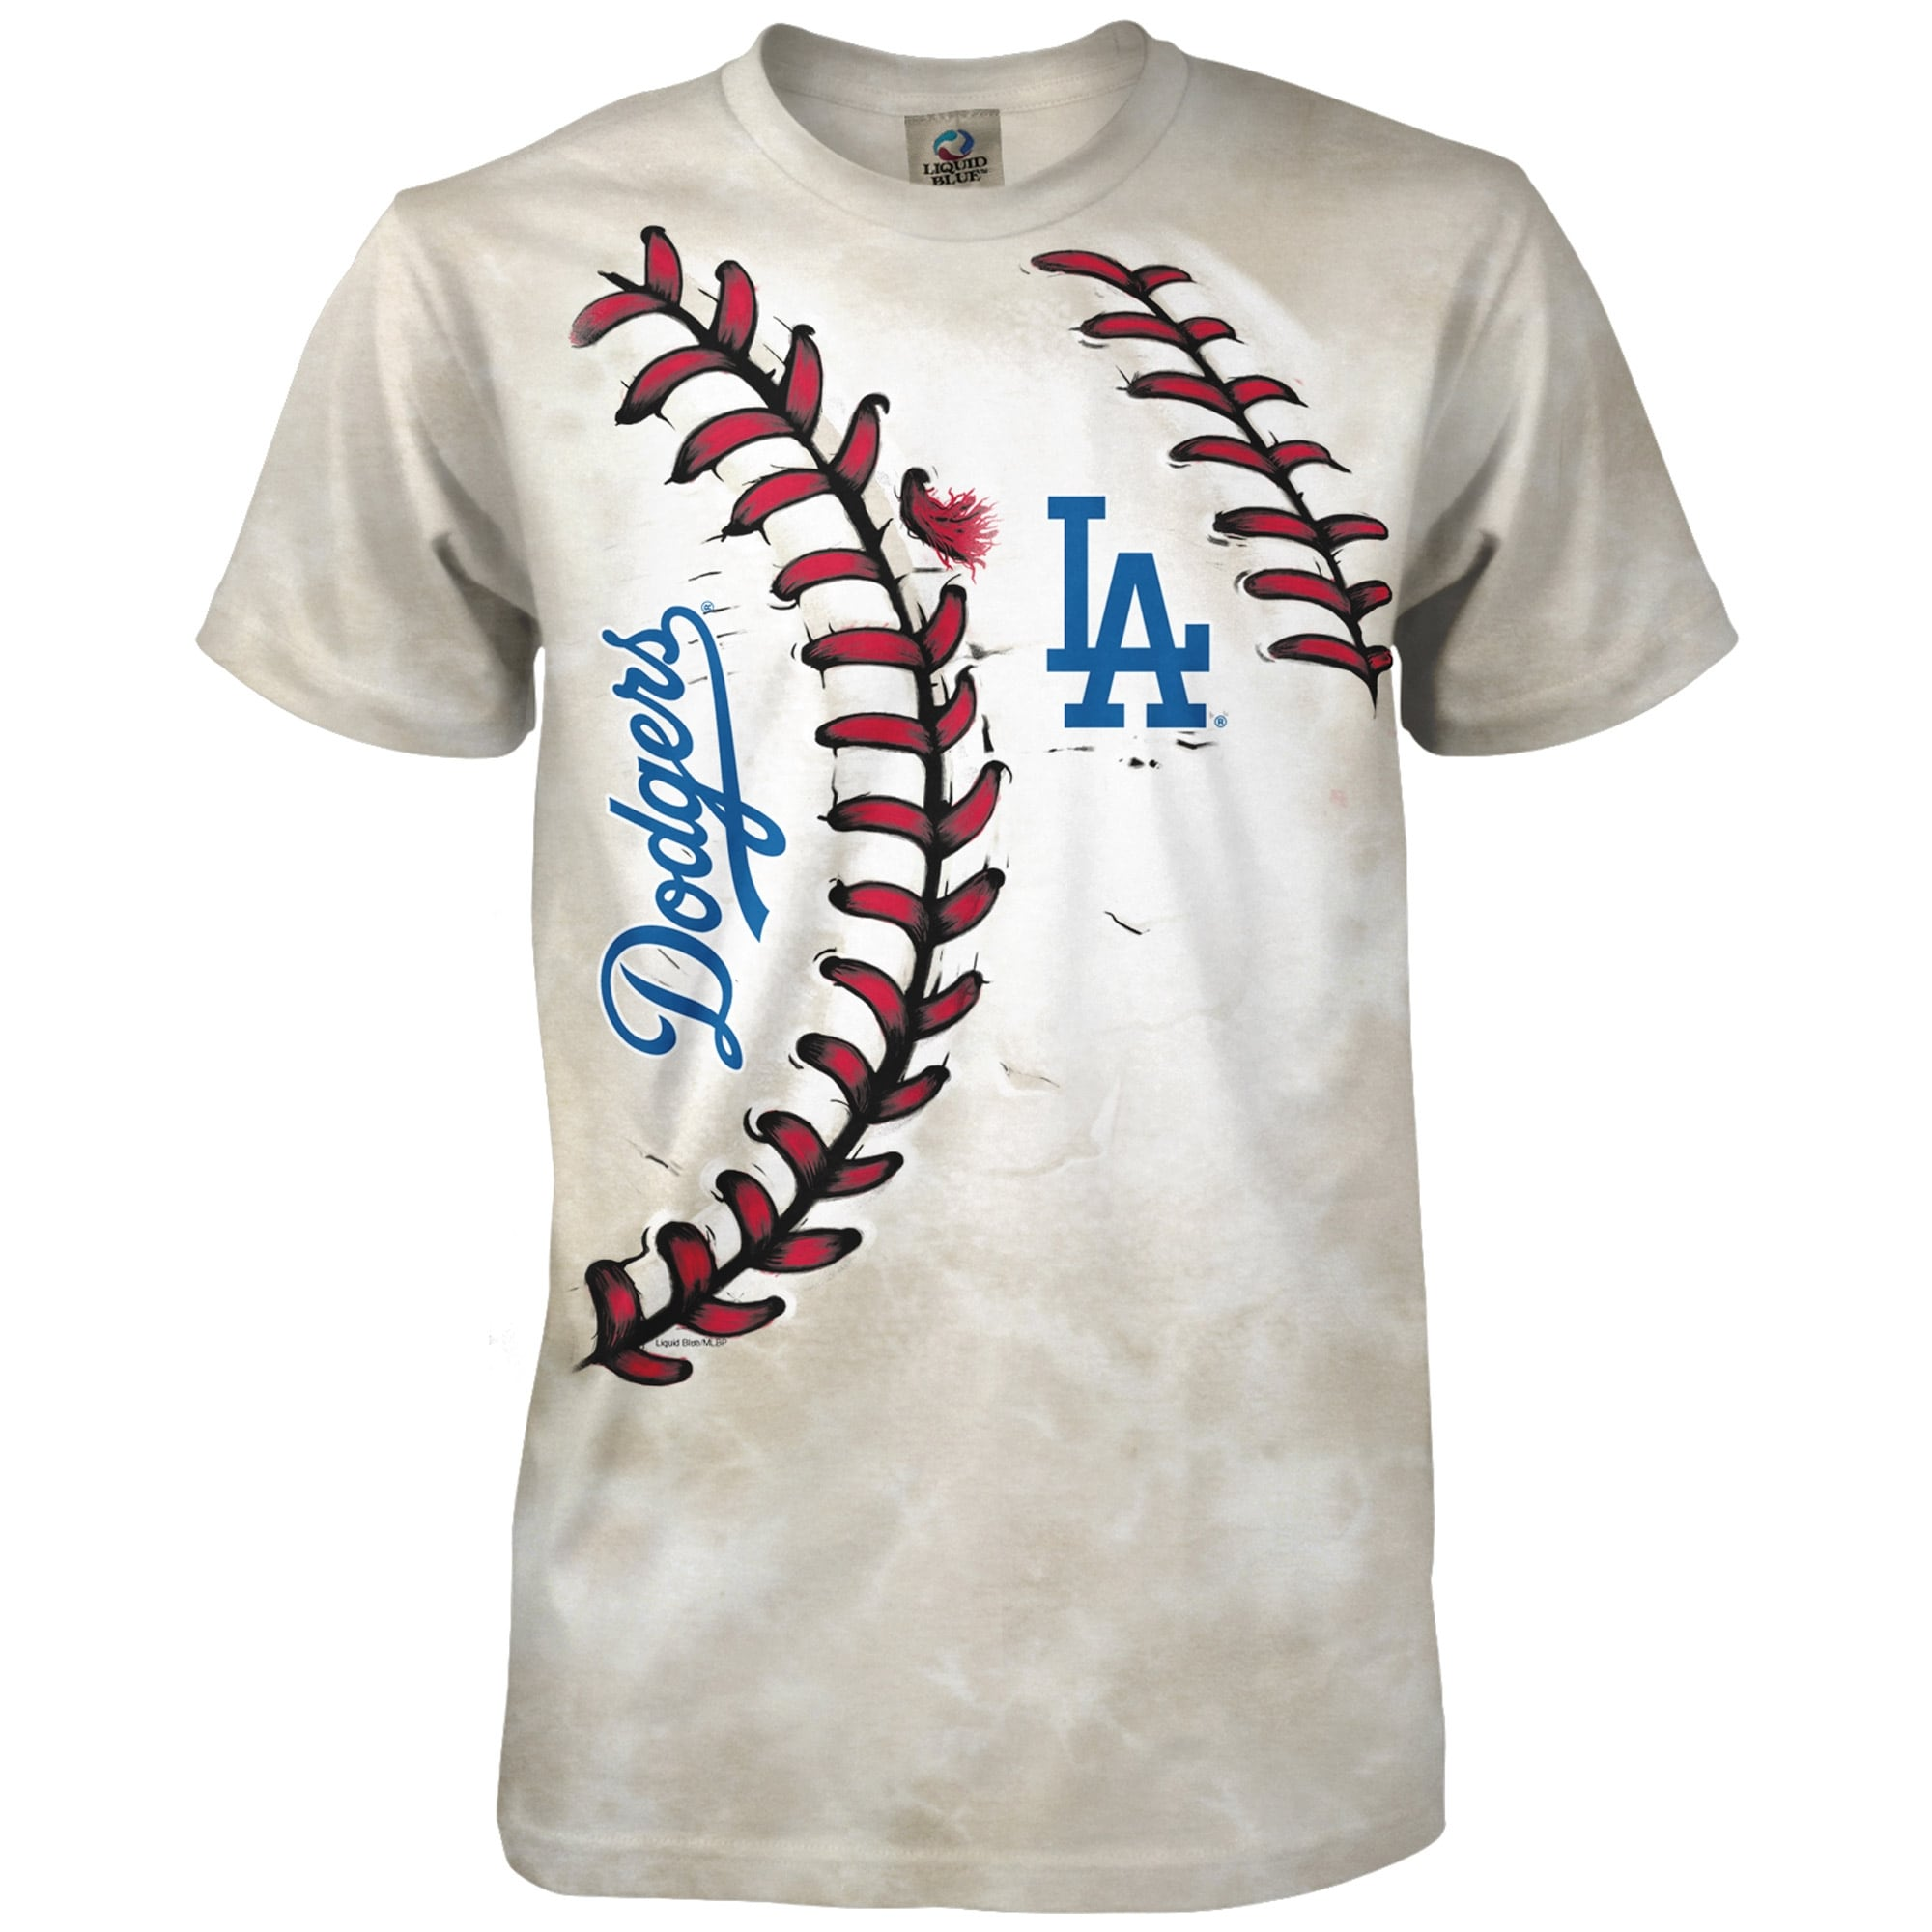 Los Angeles Dodgers Youth Hardball T-Shirt - Cream